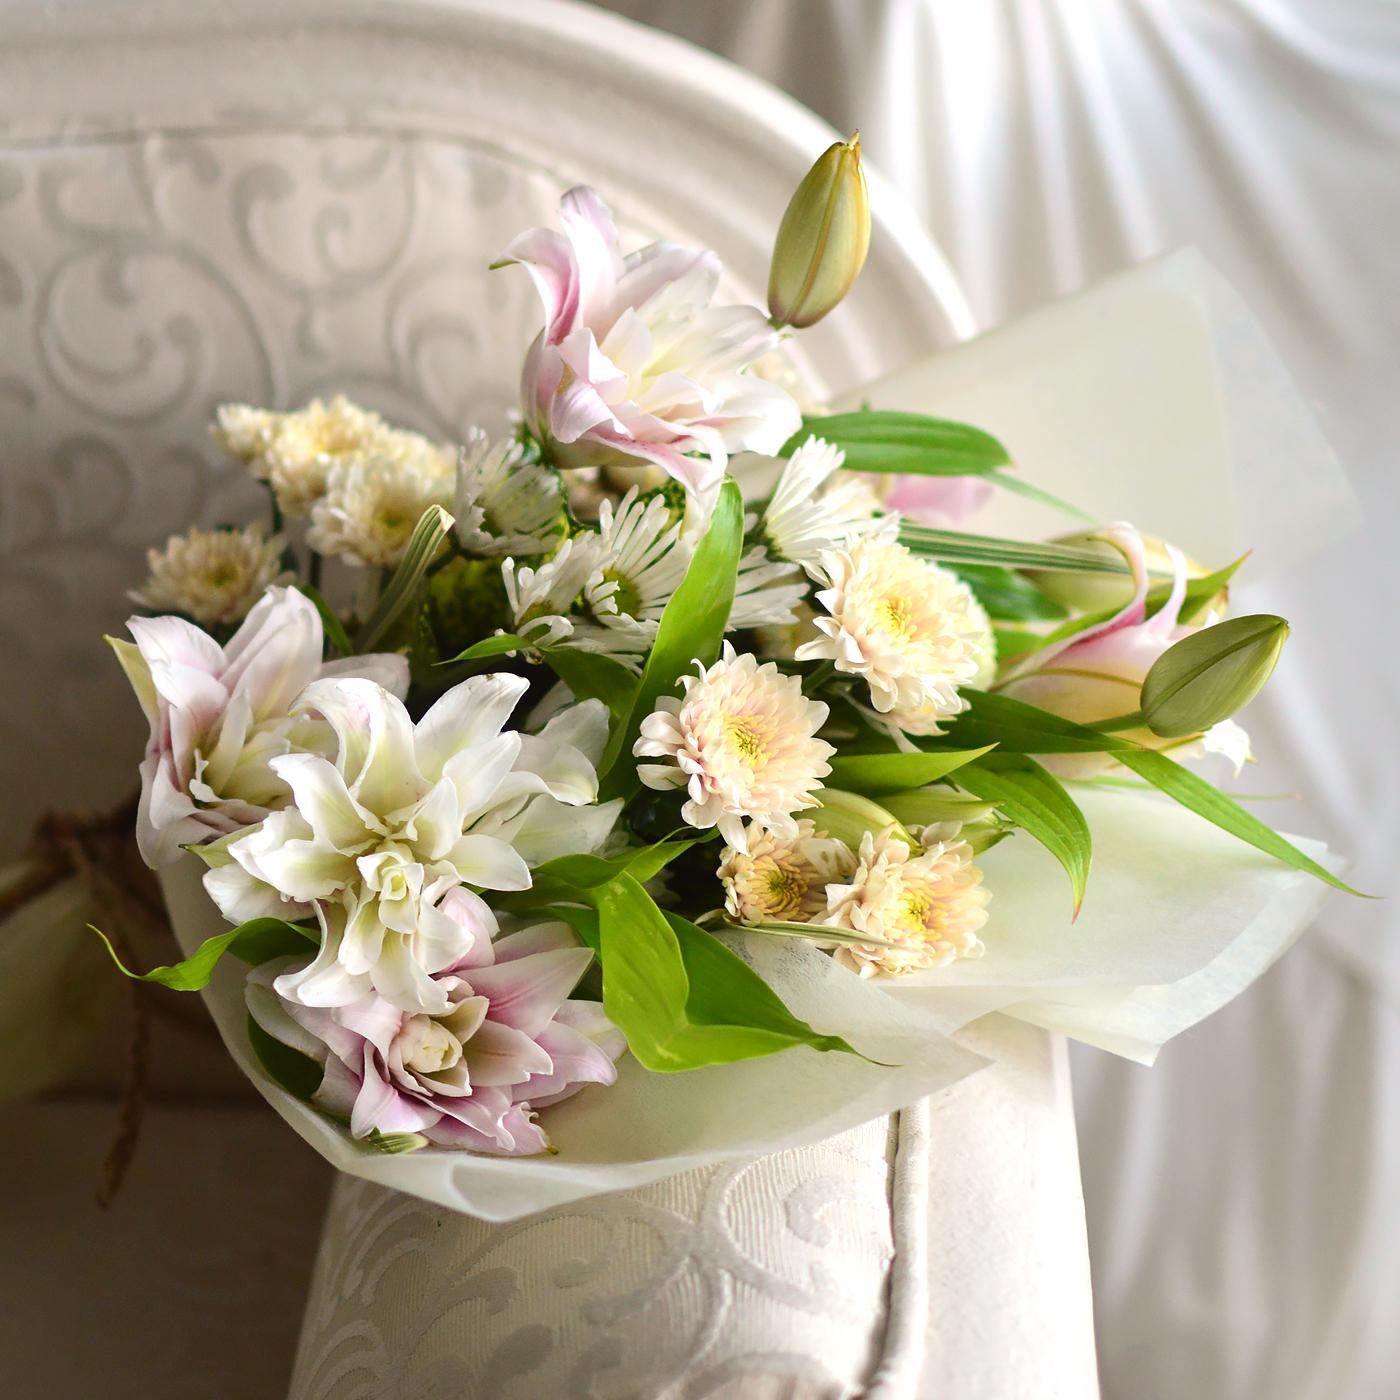 Debonair - Rose Lilies With Chrysanthemums (Bunch) - Birthday - in Sri Lanka